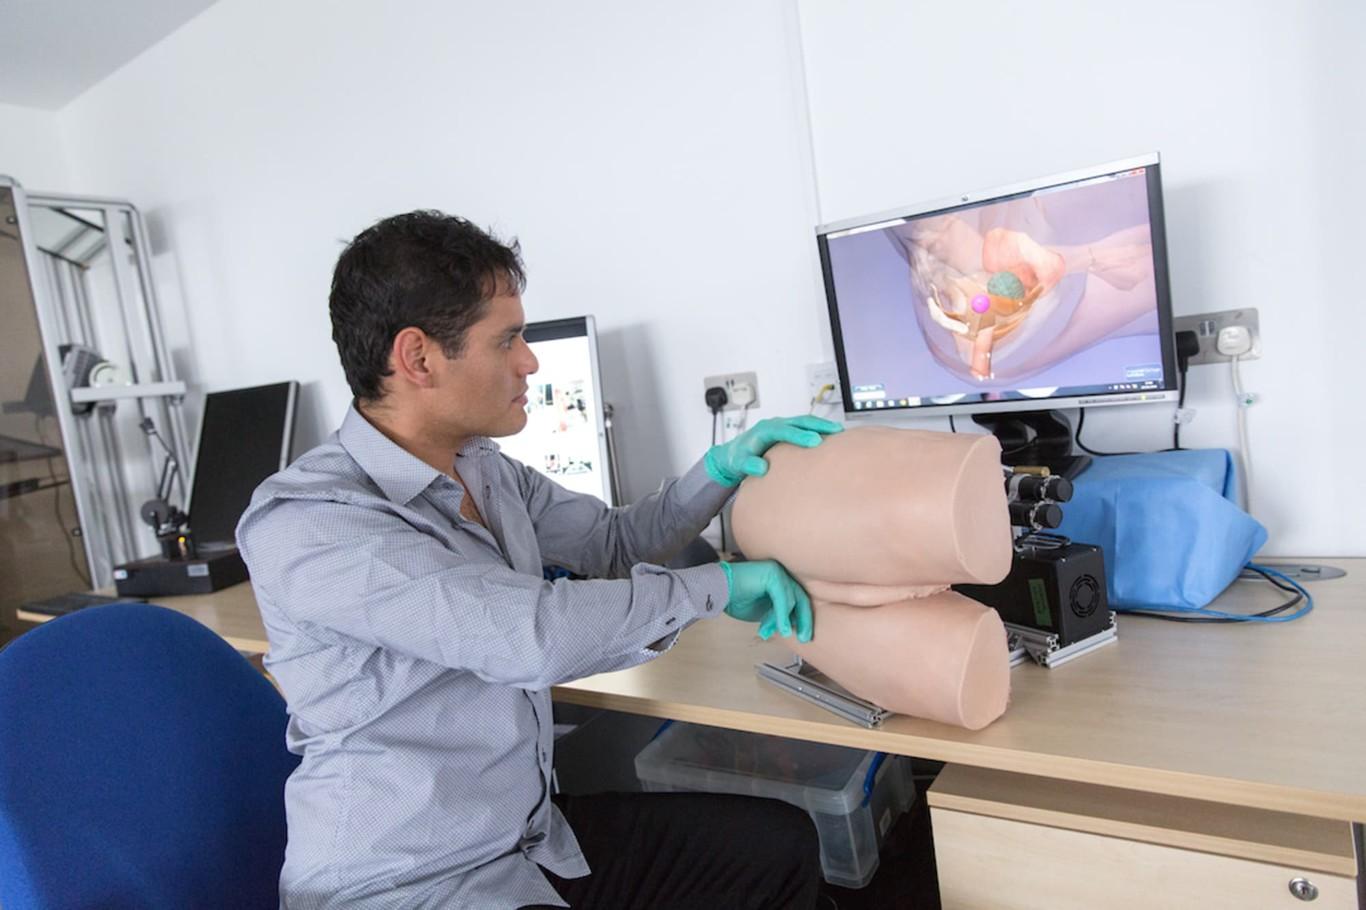 examen de próstata al caer